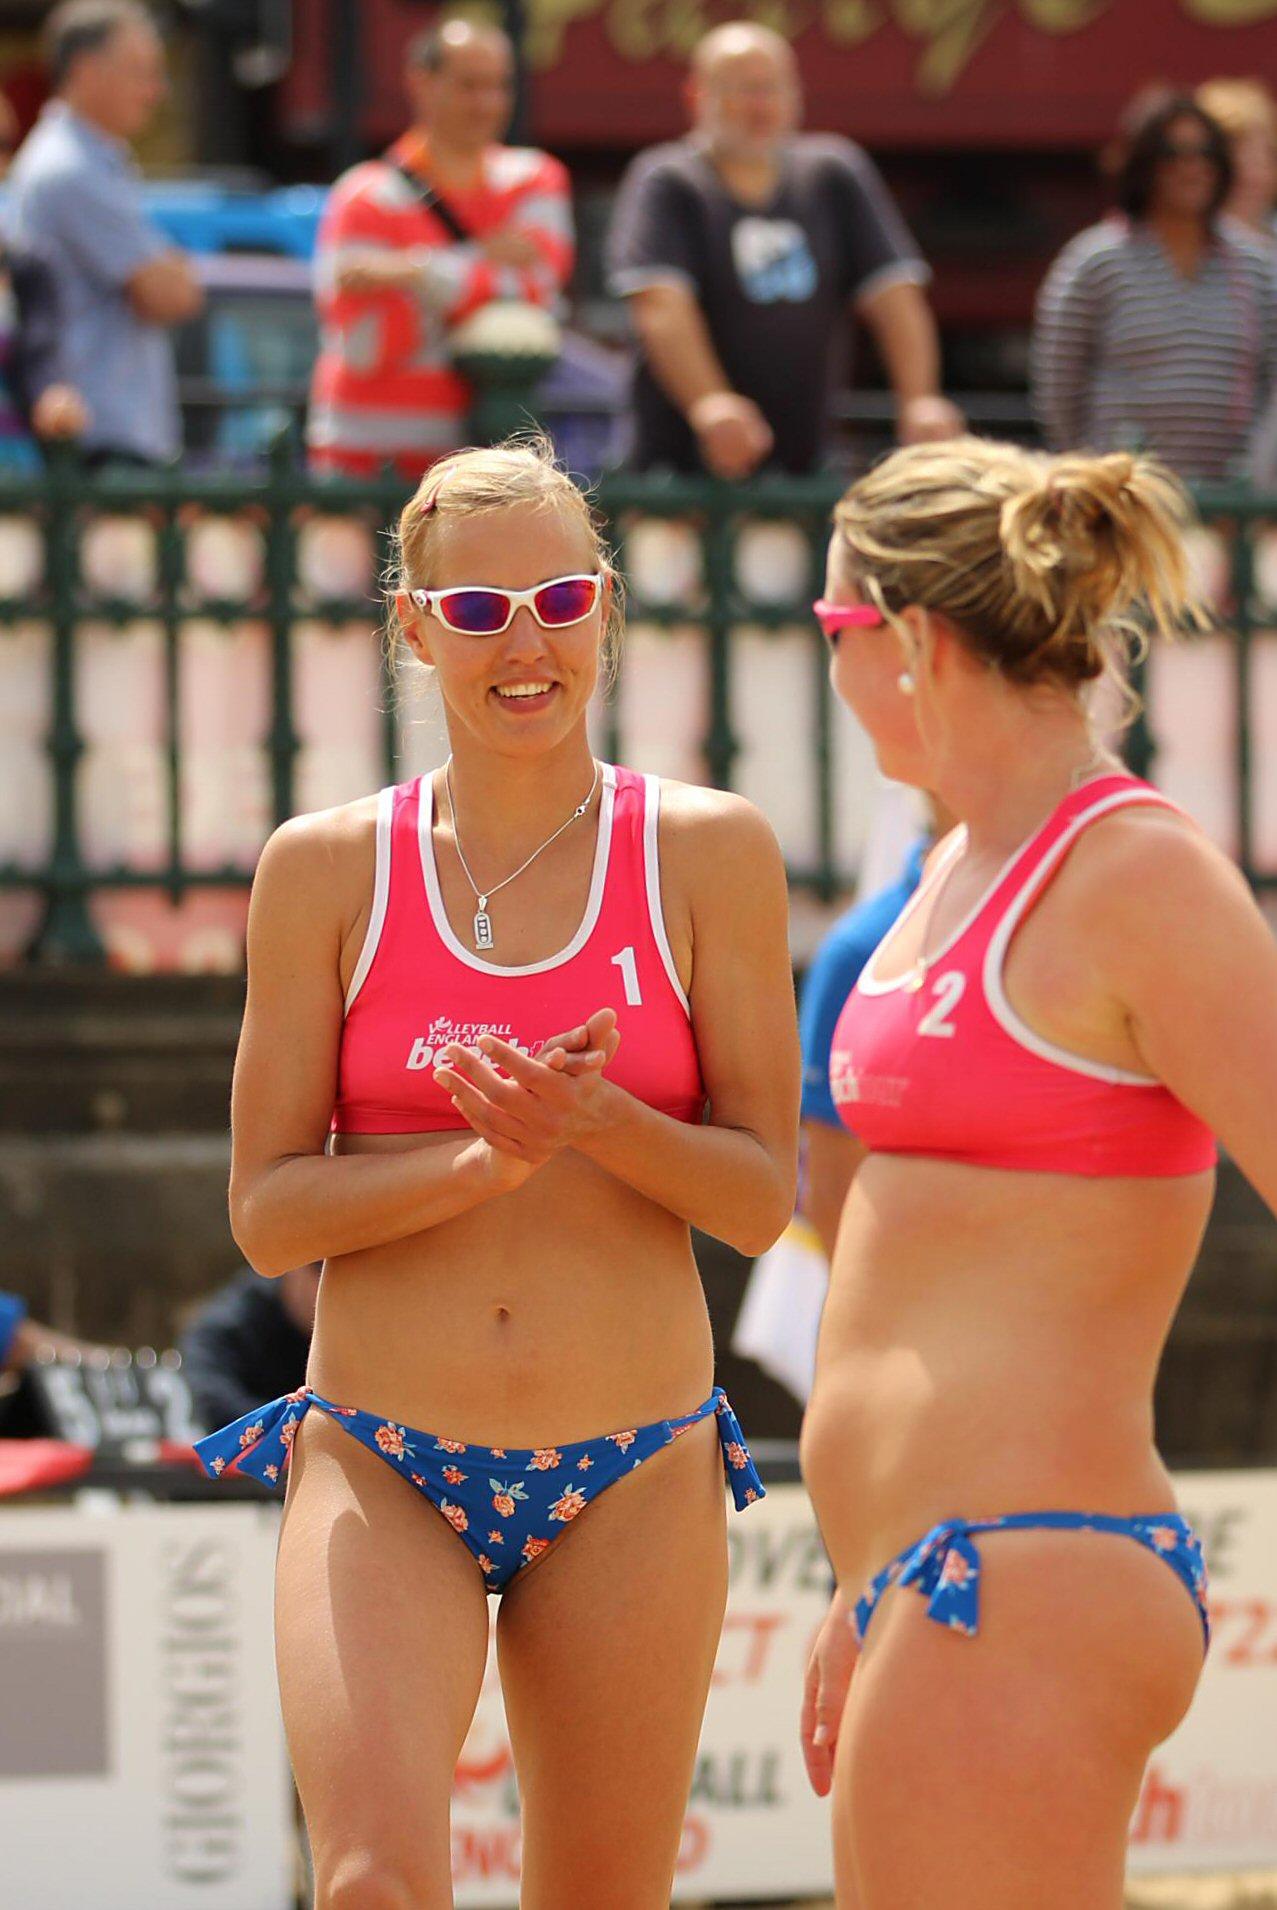 from Alijah women beach volleyball oops